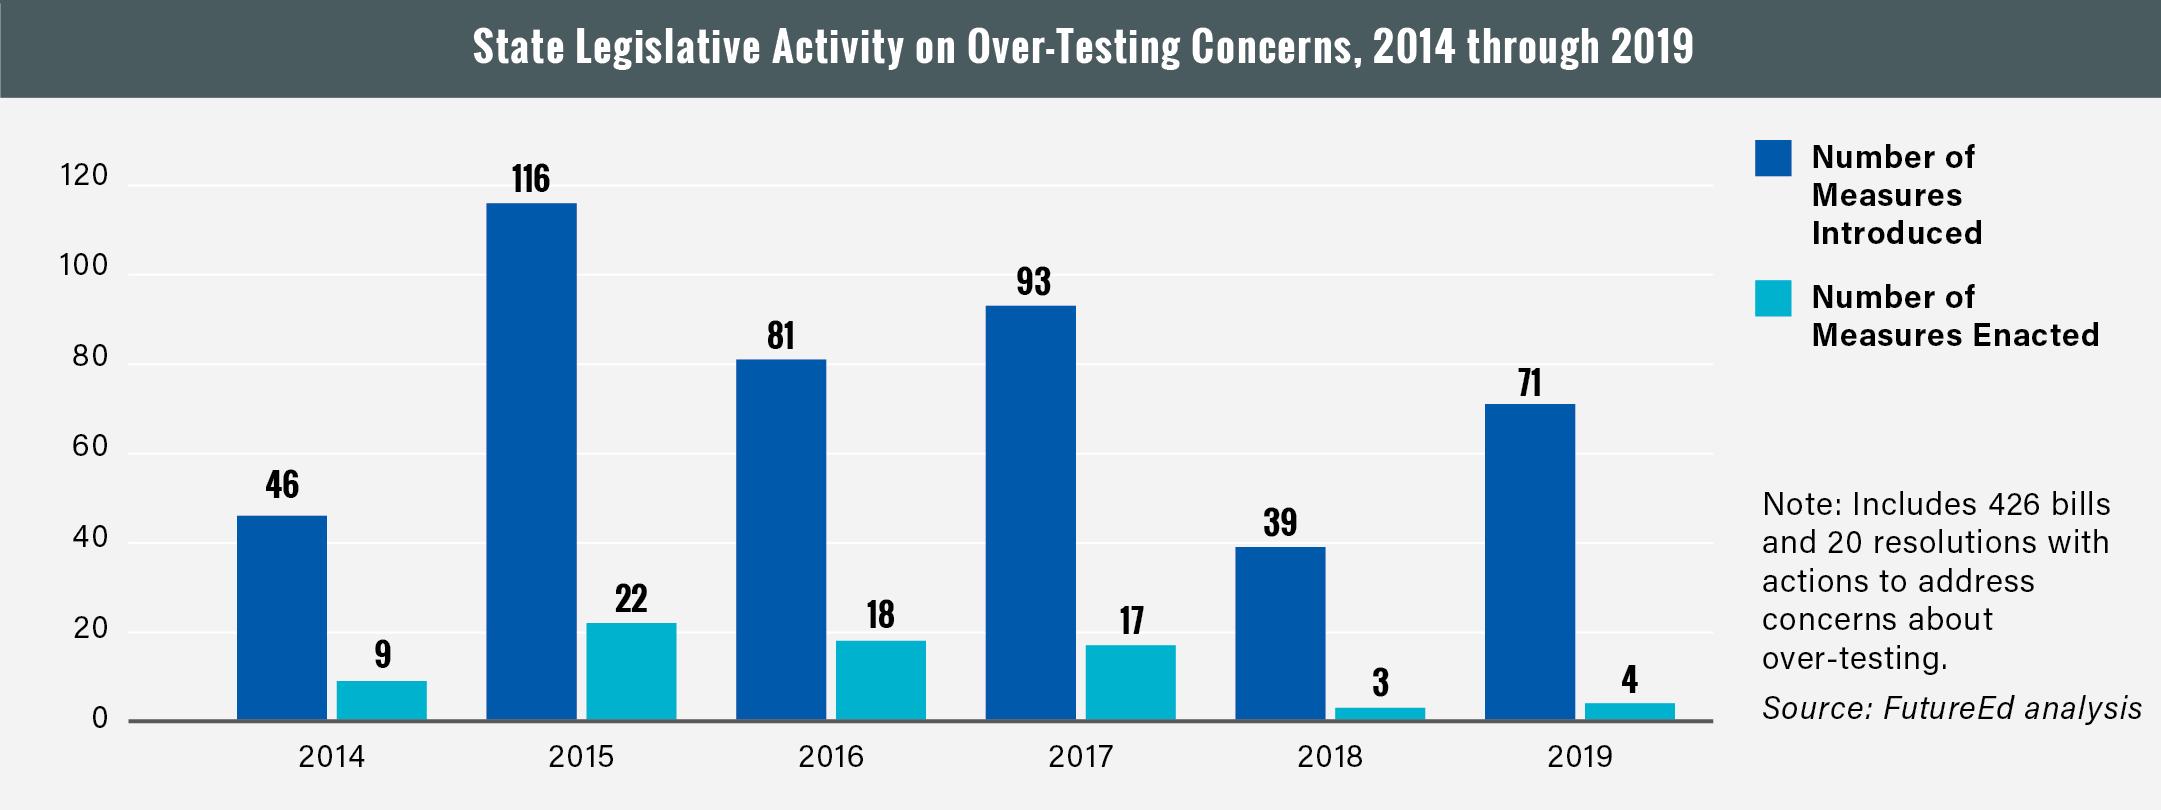 Figure: State legislative activity on over-testing concerns, 2014 through 2019